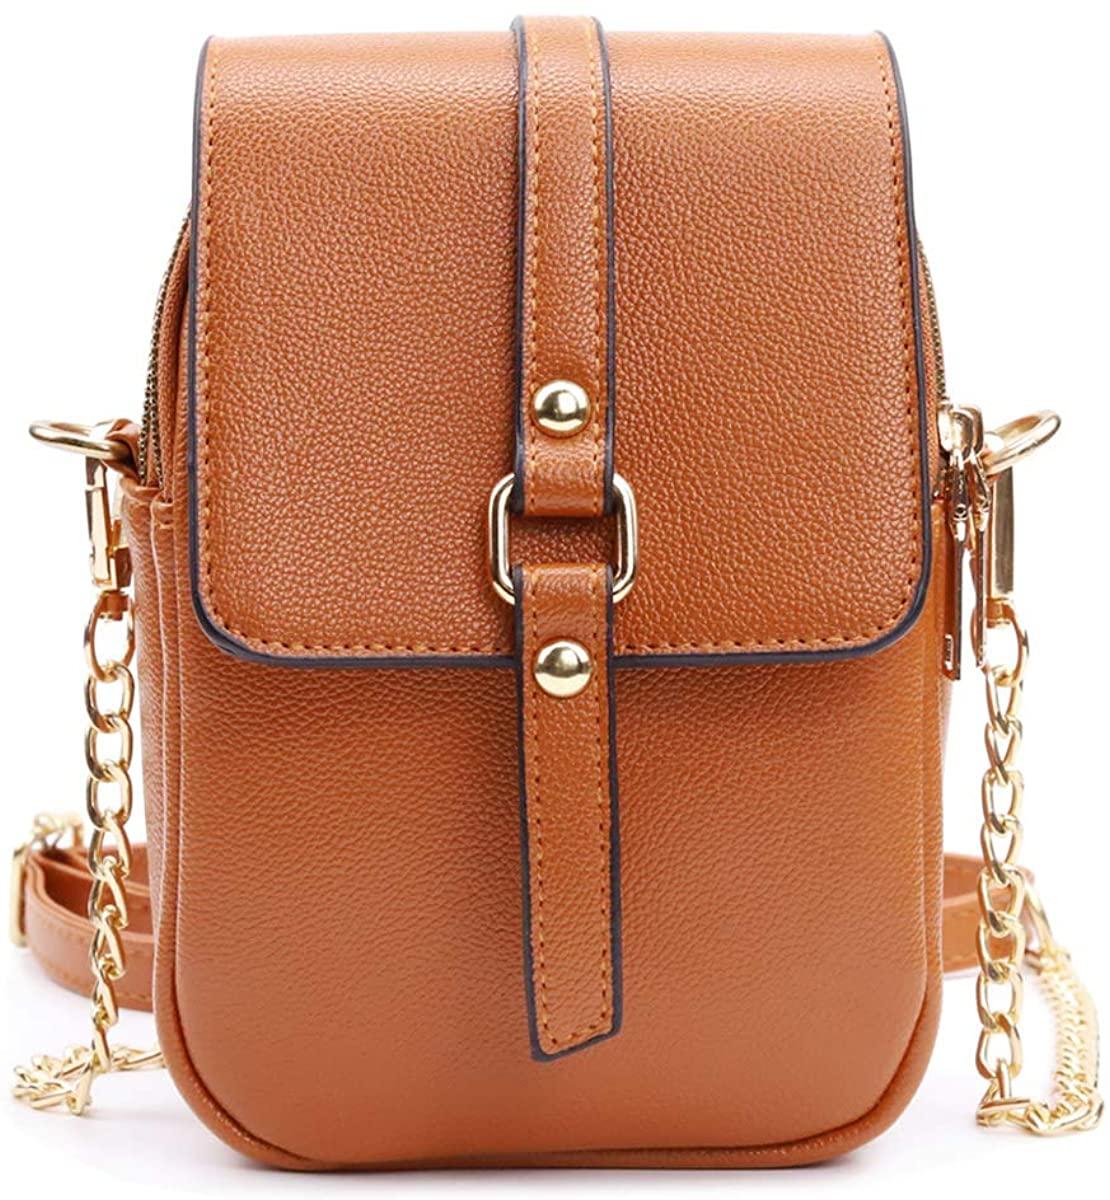 Silkarea Leather Small Crossbody Bags Phone Purse for Women Tassel CellPhone Bag Shoulder Bag Handbag Wallet Pouch